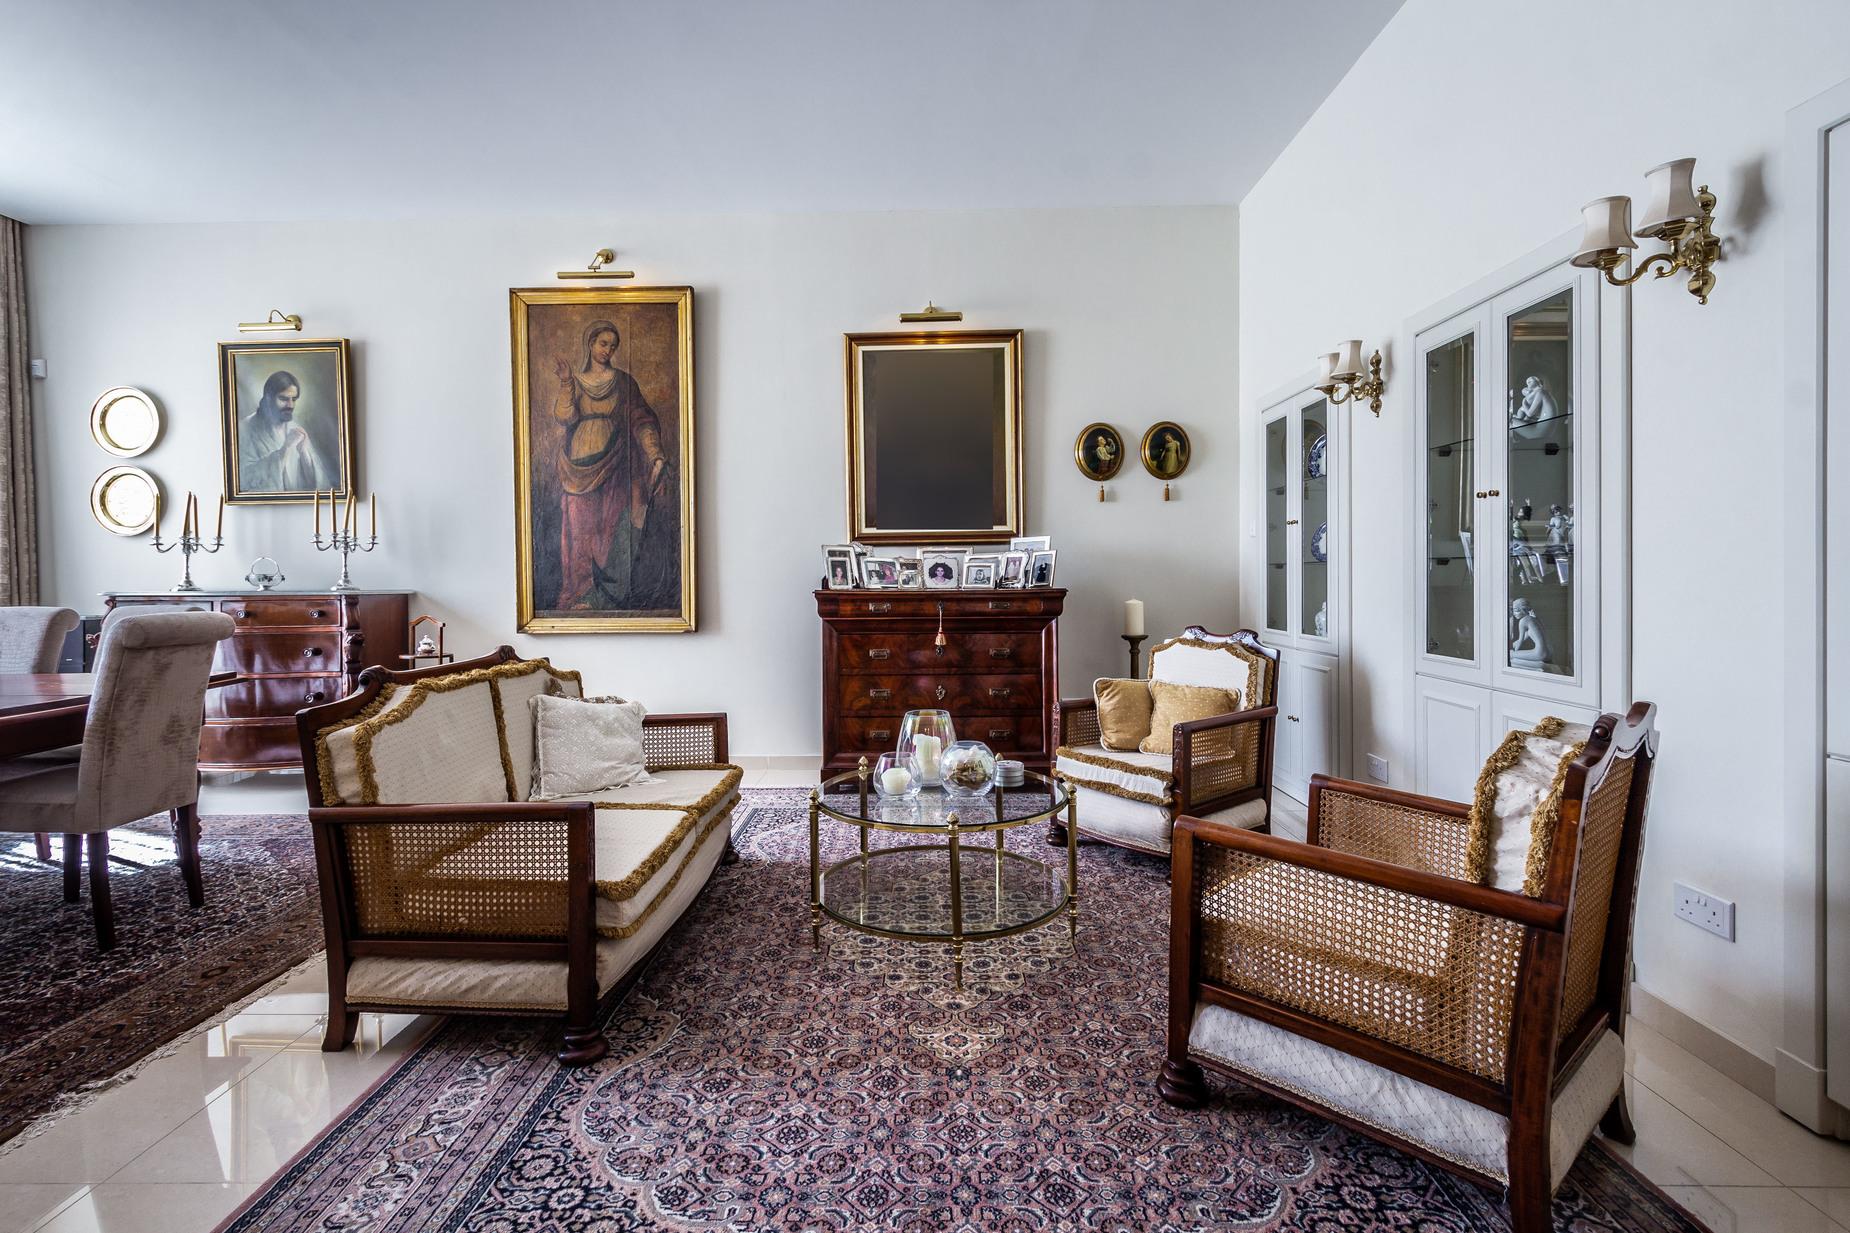 3 bed Town House For Sale in Balzan, Balzan - thumb 4